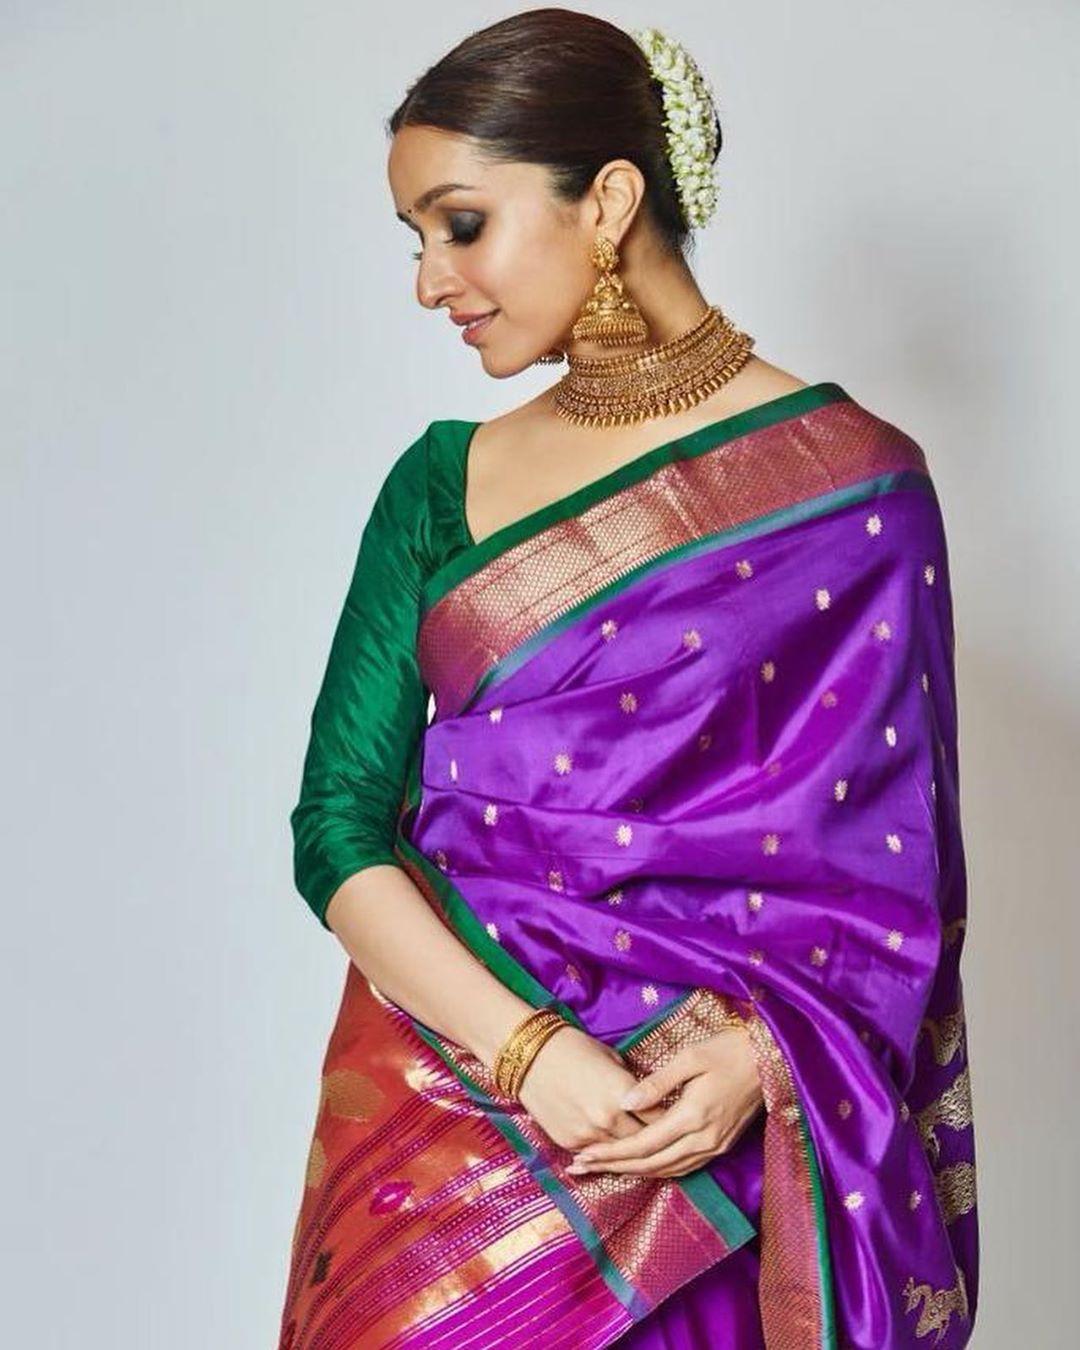 Shraddha Kapoor festive wear